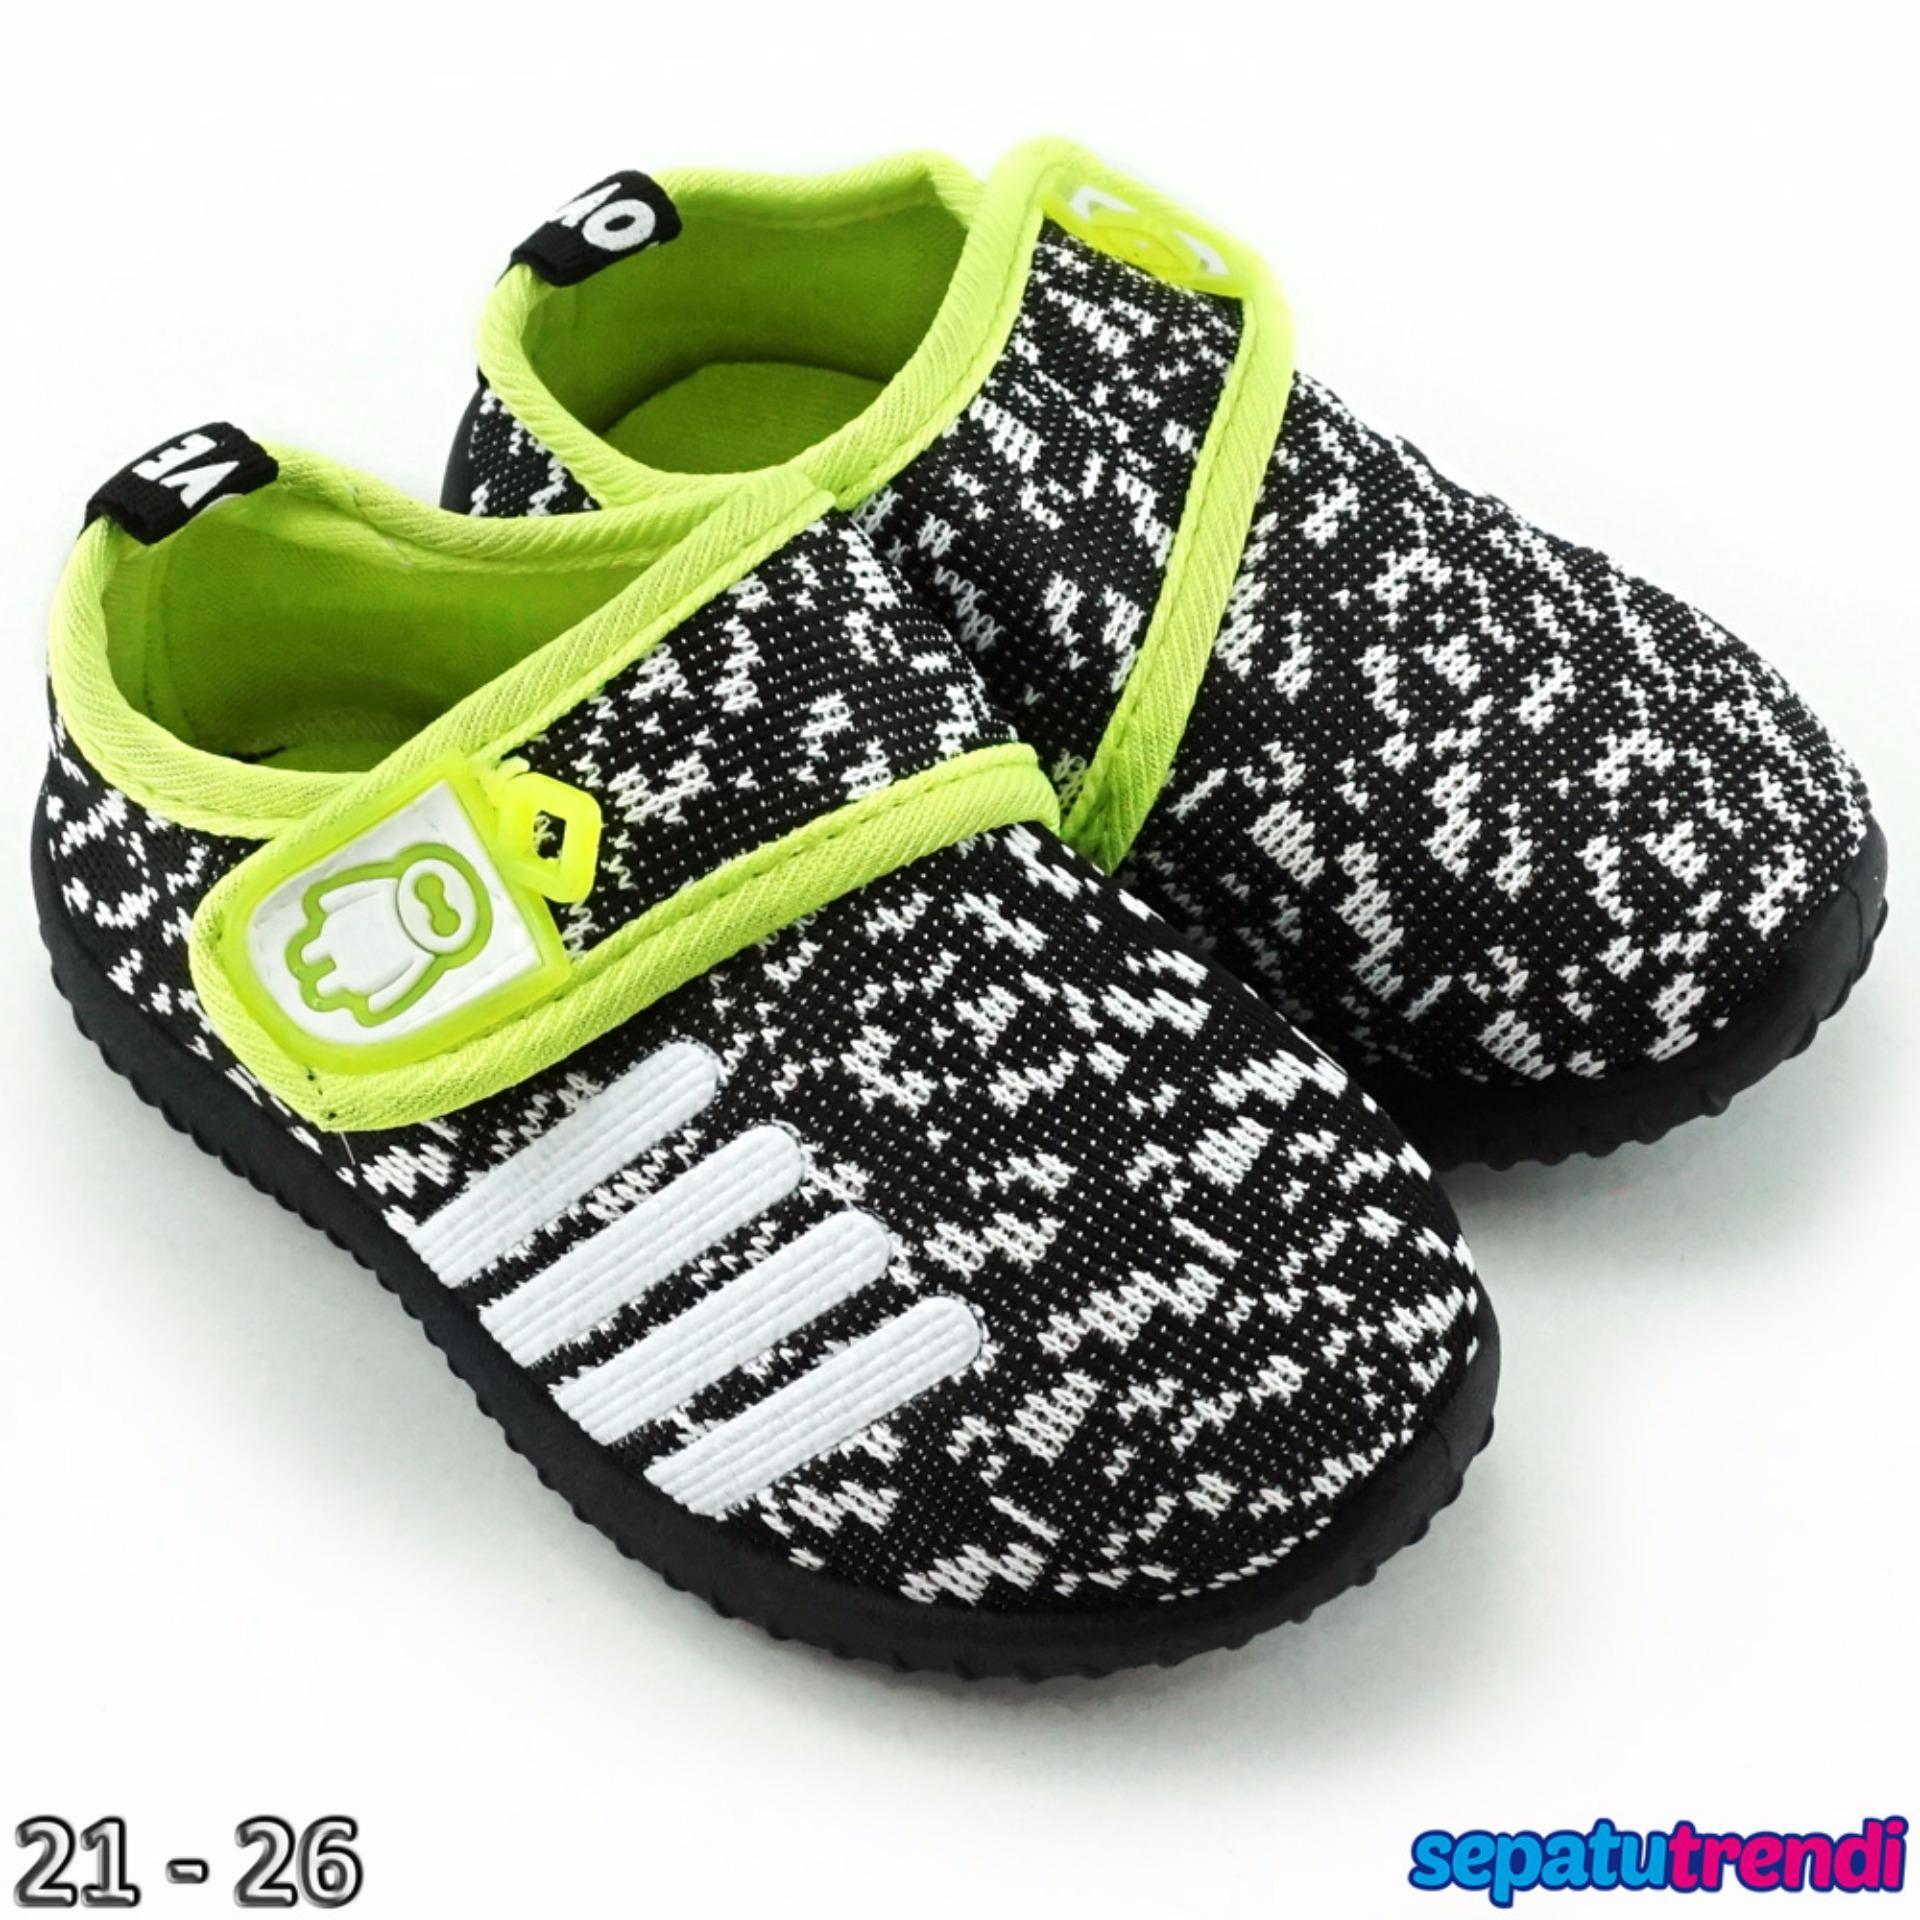 TrendiShoes Sepatu Anak Bayi Laki-Laki Import BMXA9 - Putih | Lazada Indonesia